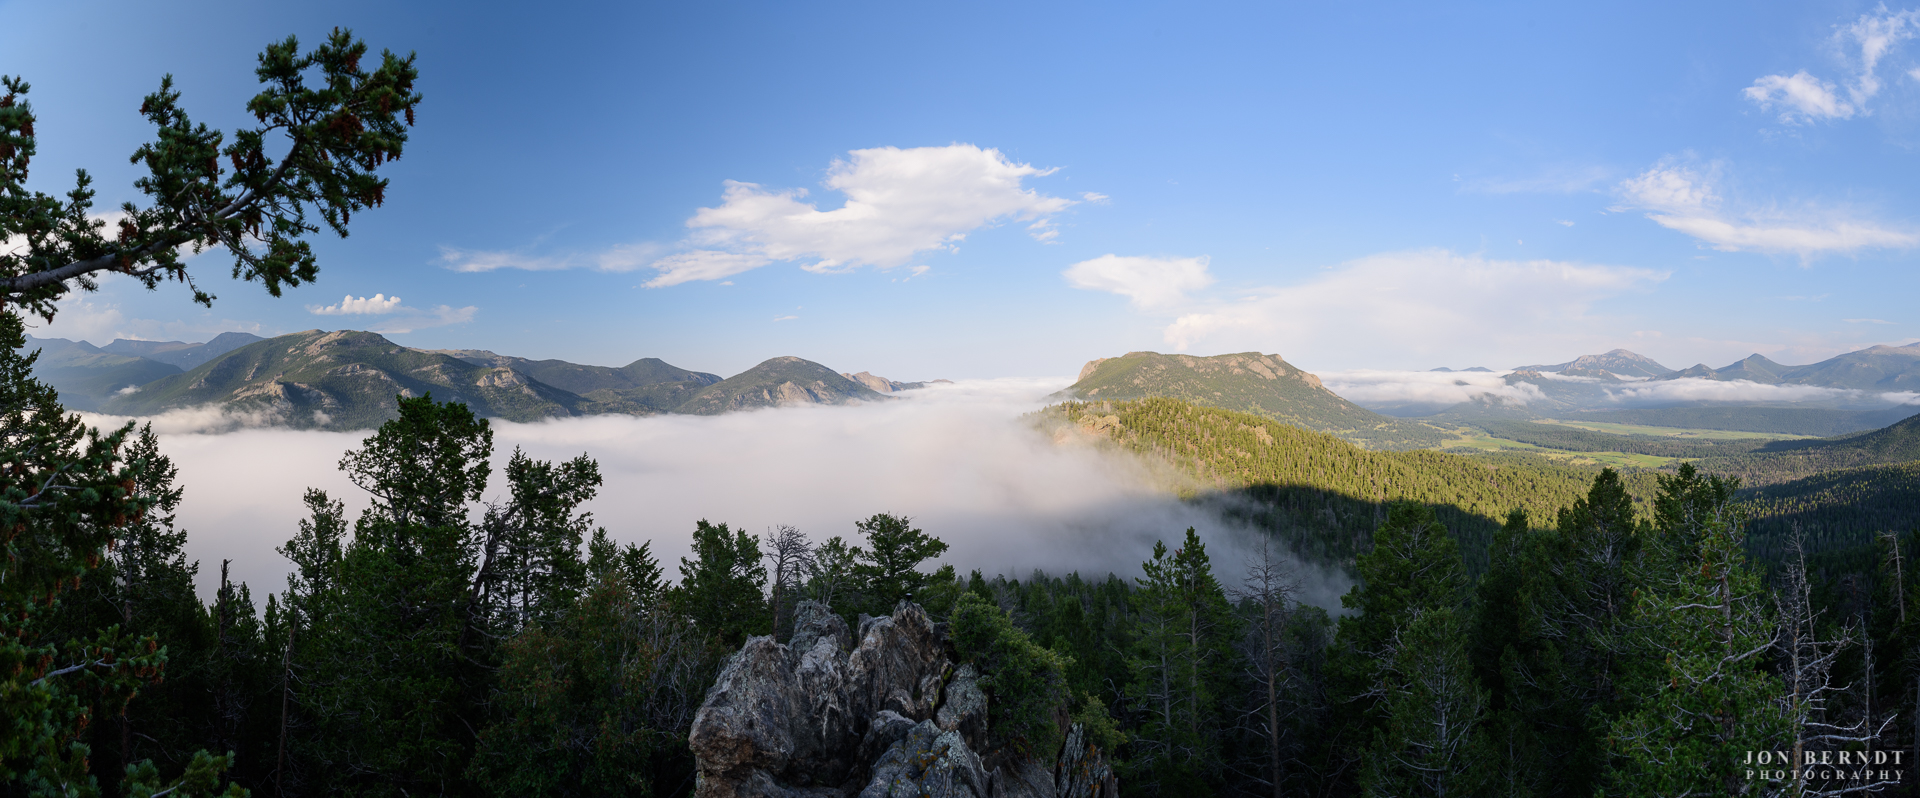 Fog rolls in from Estes Park into RMNP (Rocky Mountain NationalPark).(C) 2017 Jon Berndt Photography